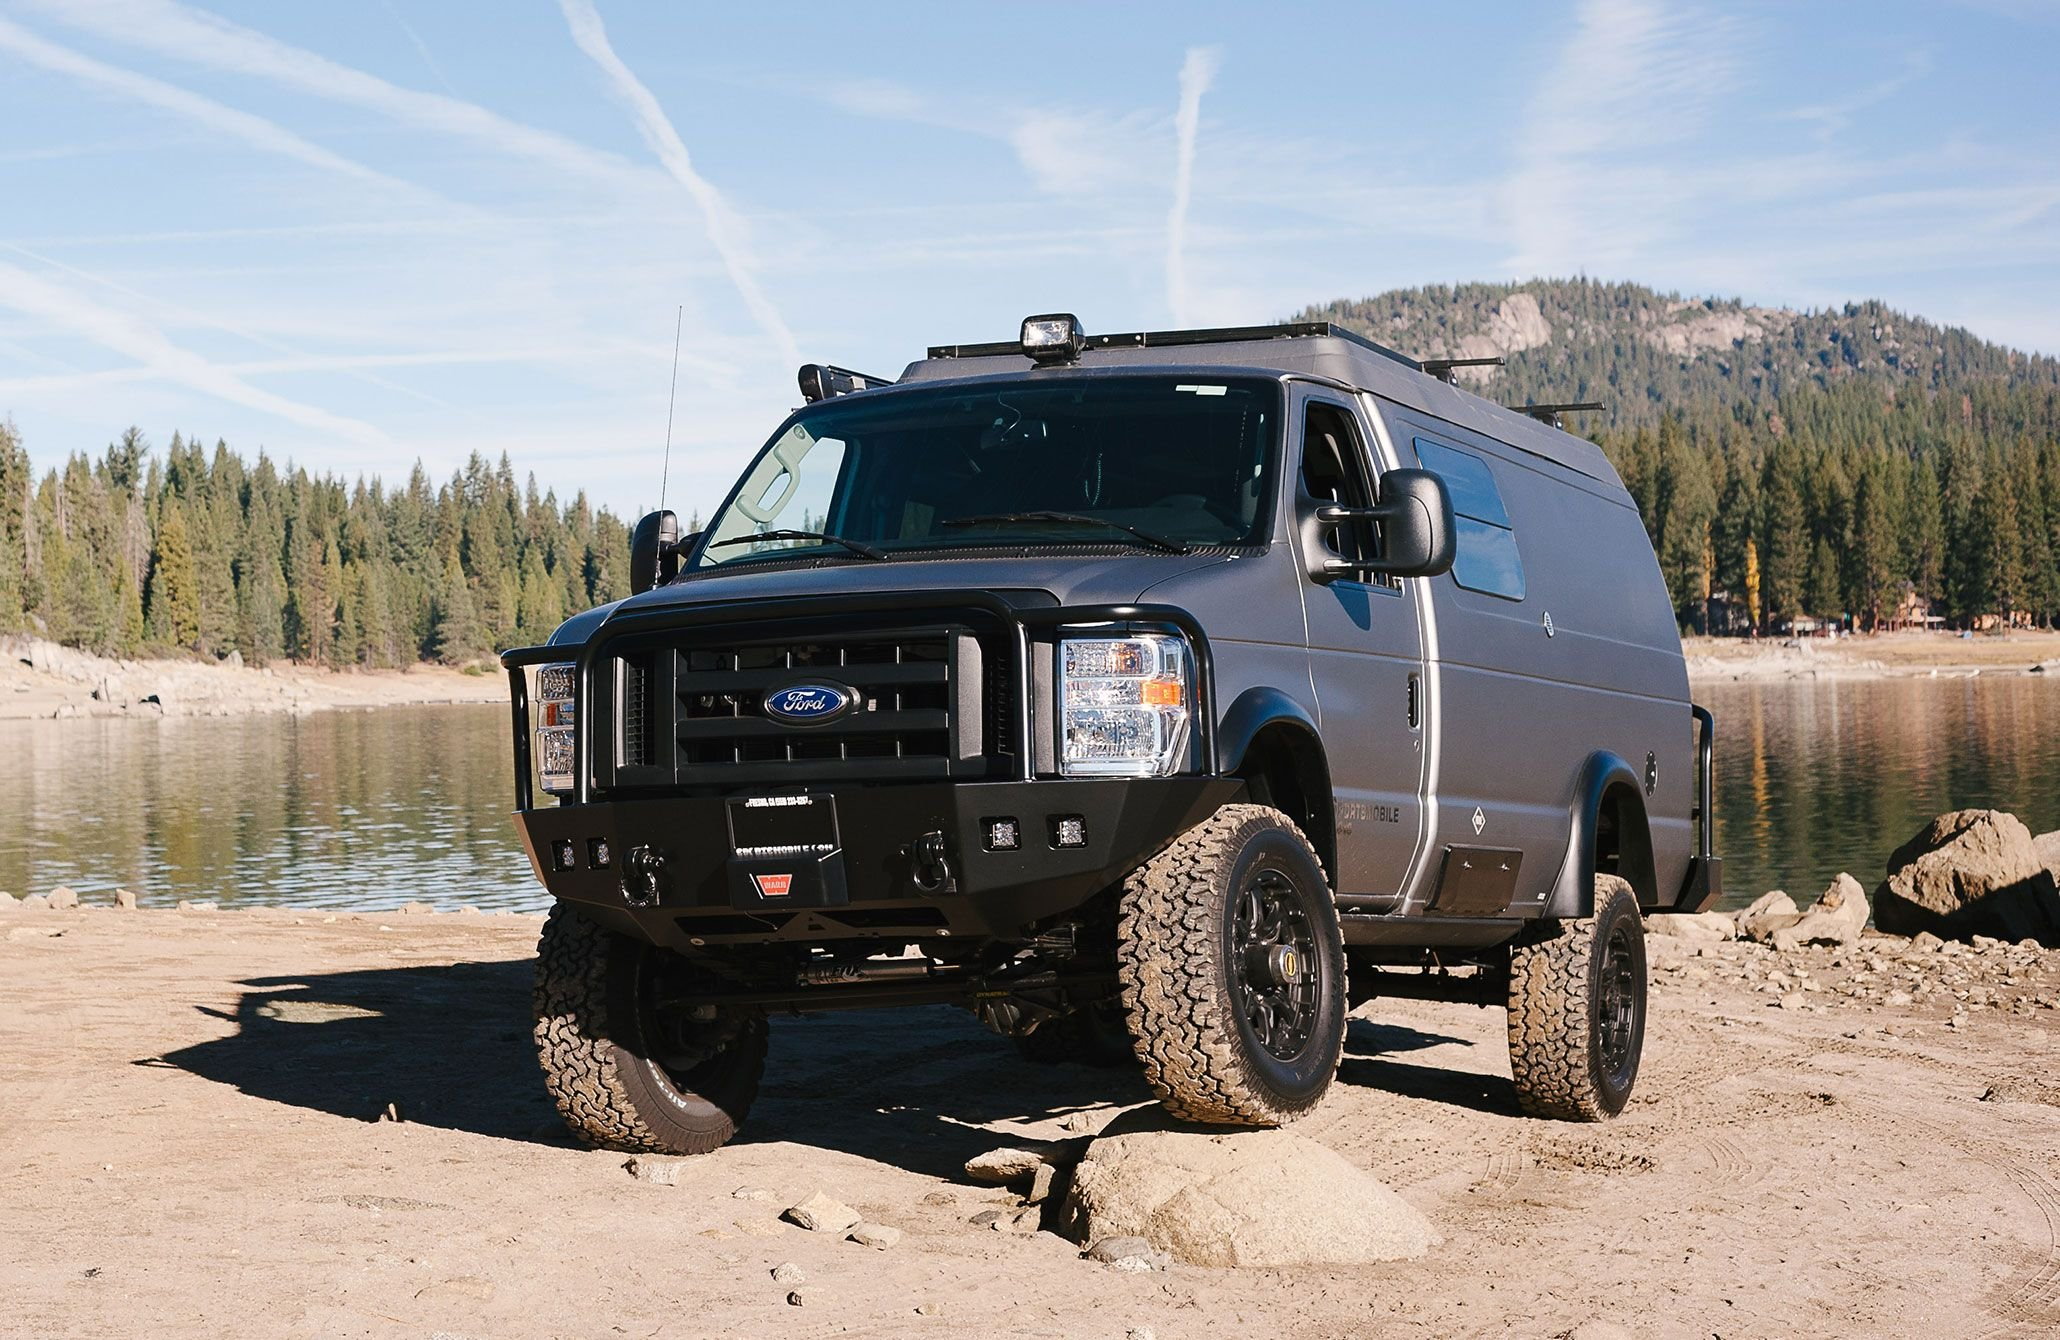 Econoline 4x4 Camper >> 2015 Sportsmobile Ford E-350 van camper motorhome 4x4 f350 wallpaper | 2060x1340 | 859748 ...